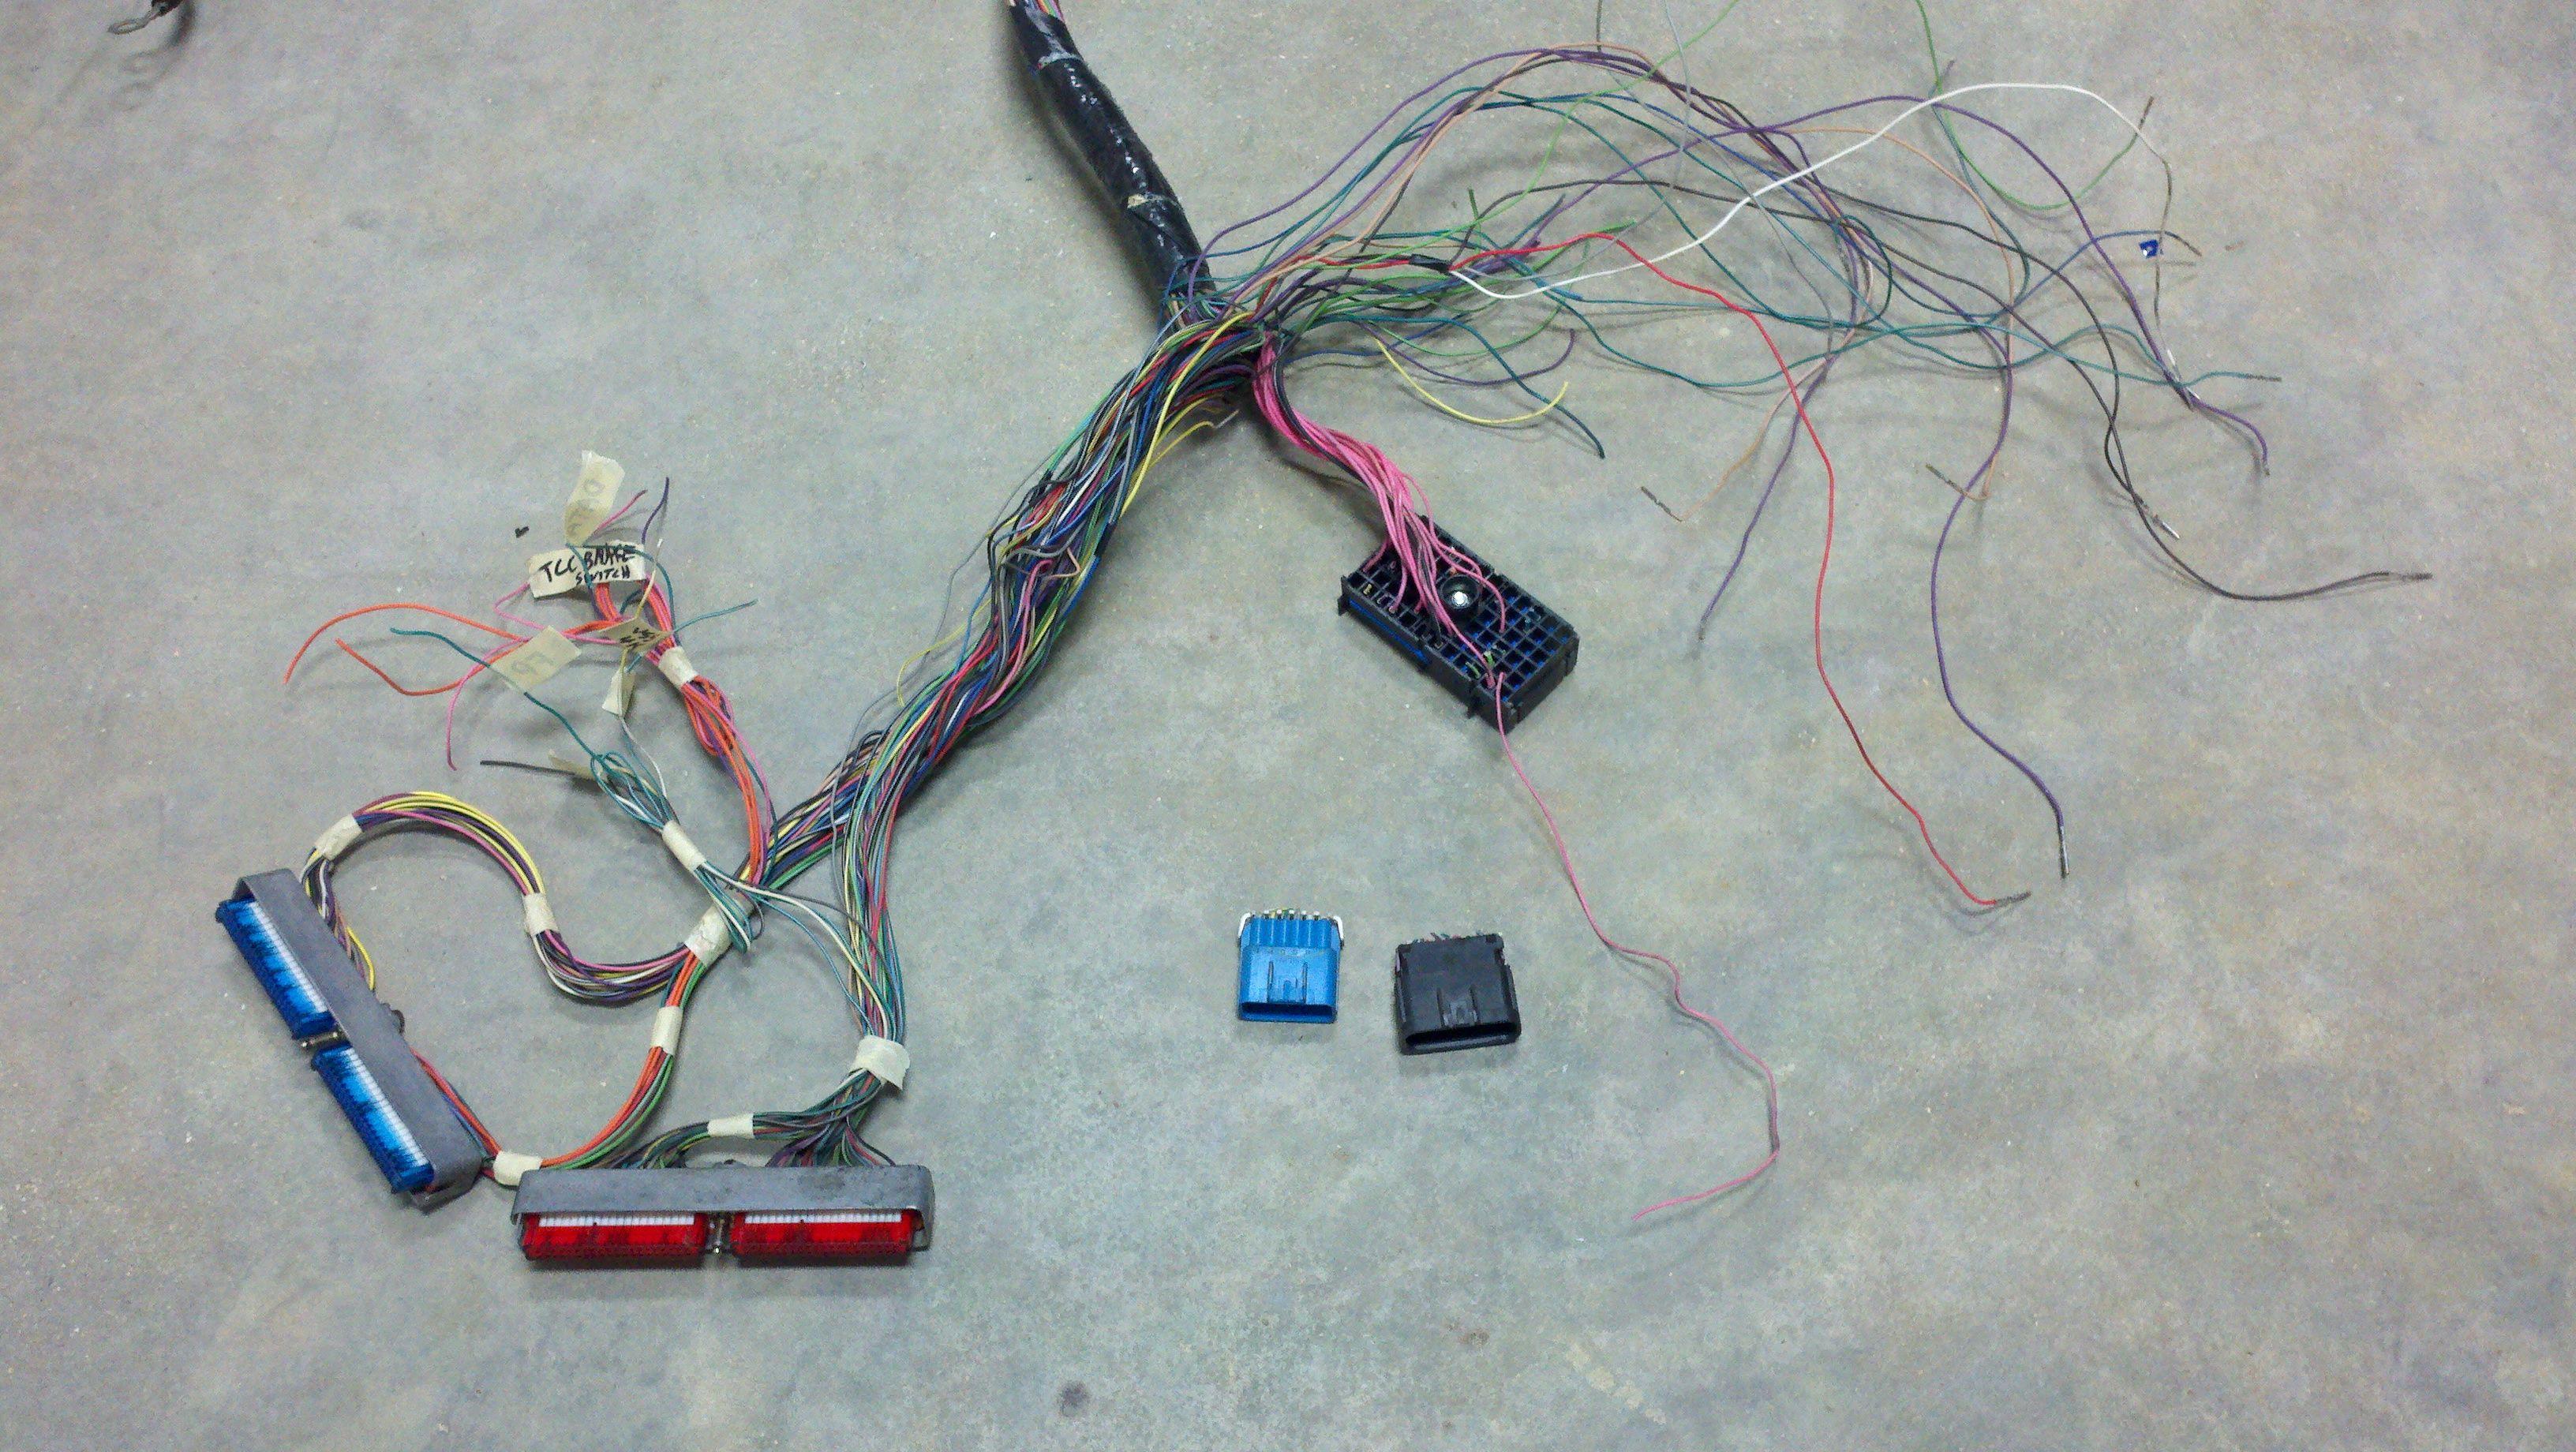 vortec 4 8 5 3 6 0 wiring harness info [ 3264 x 1840 Pixel ]